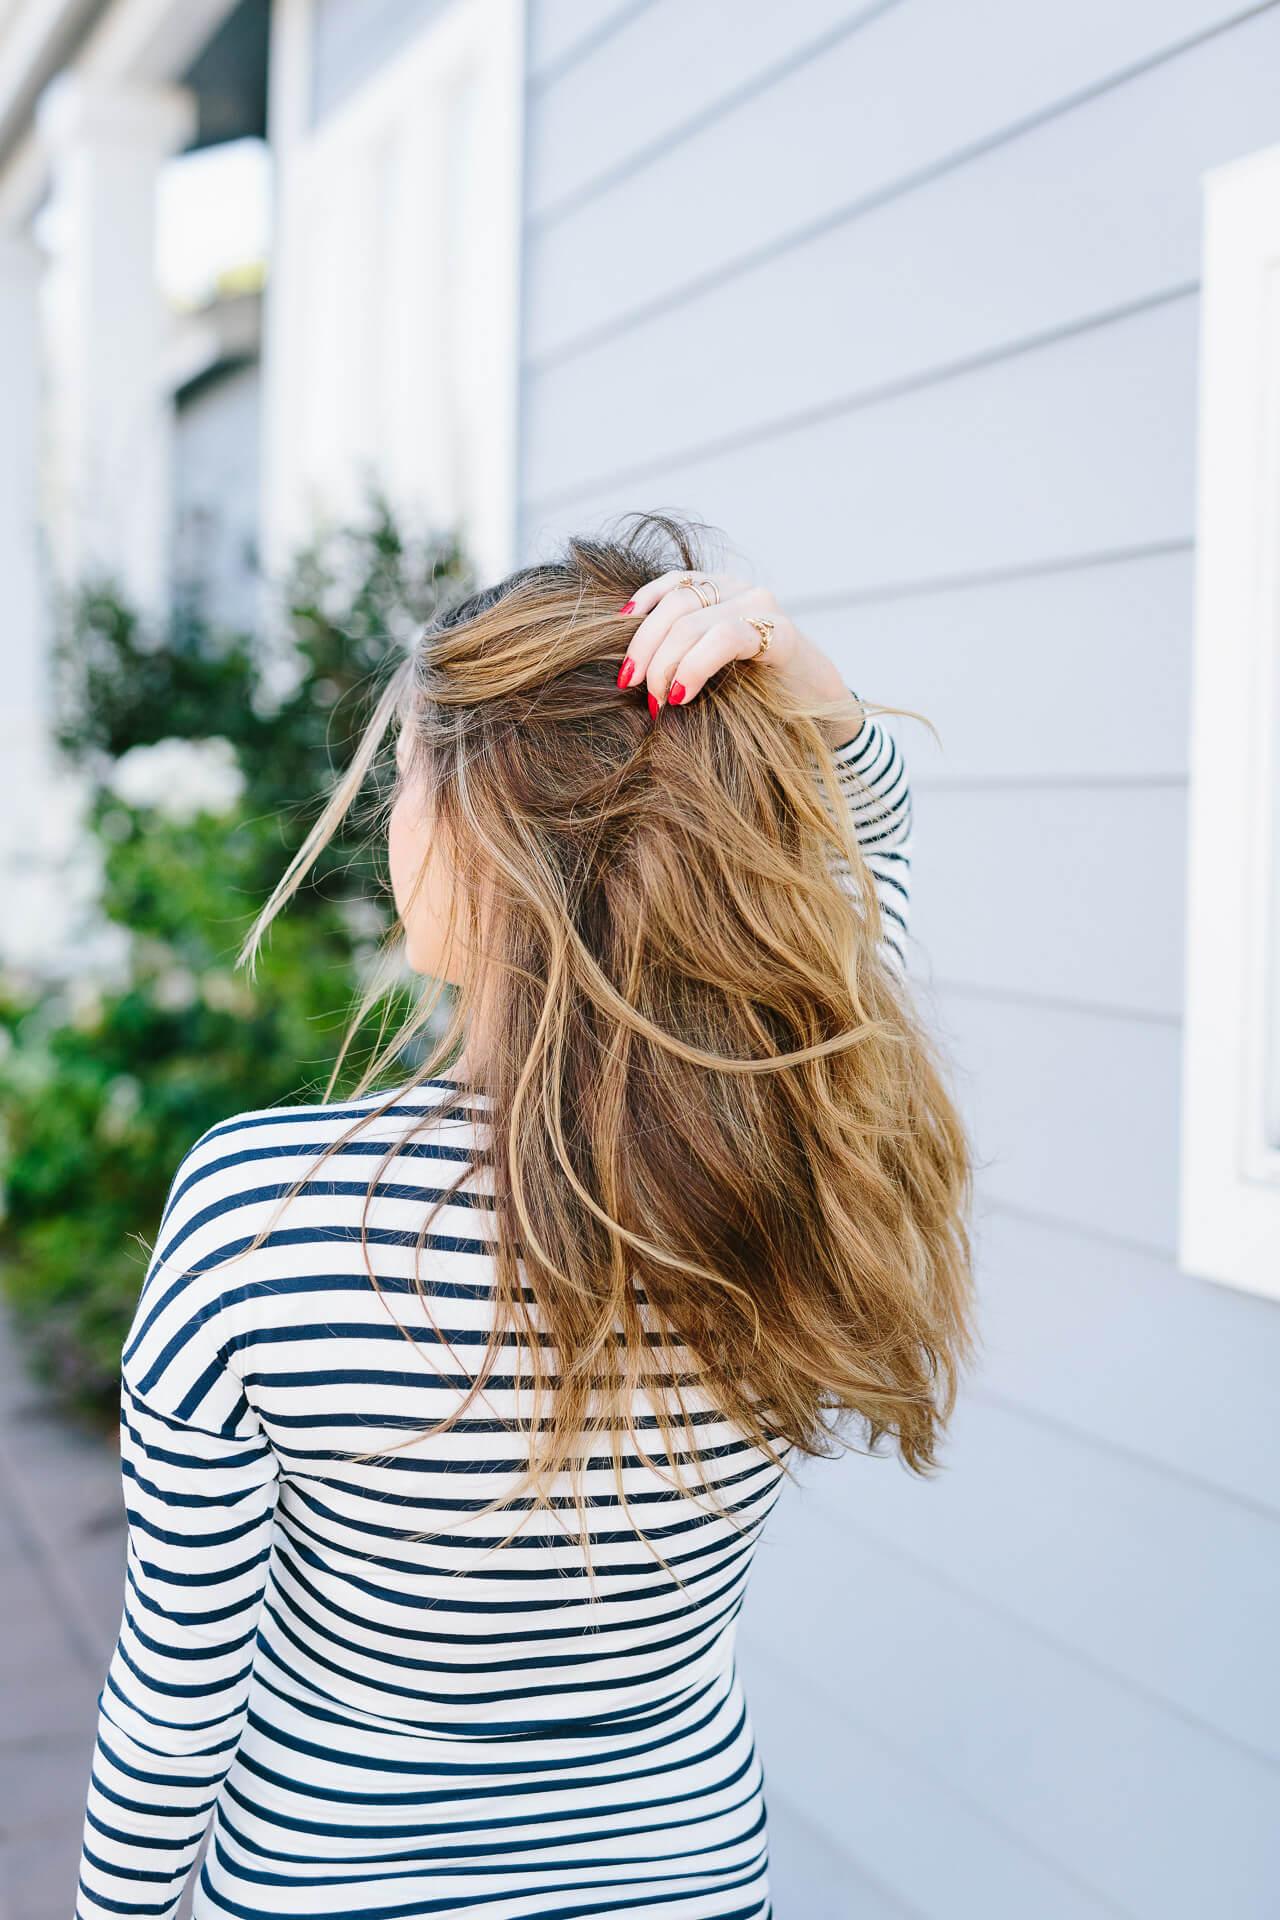 beverly hills hair